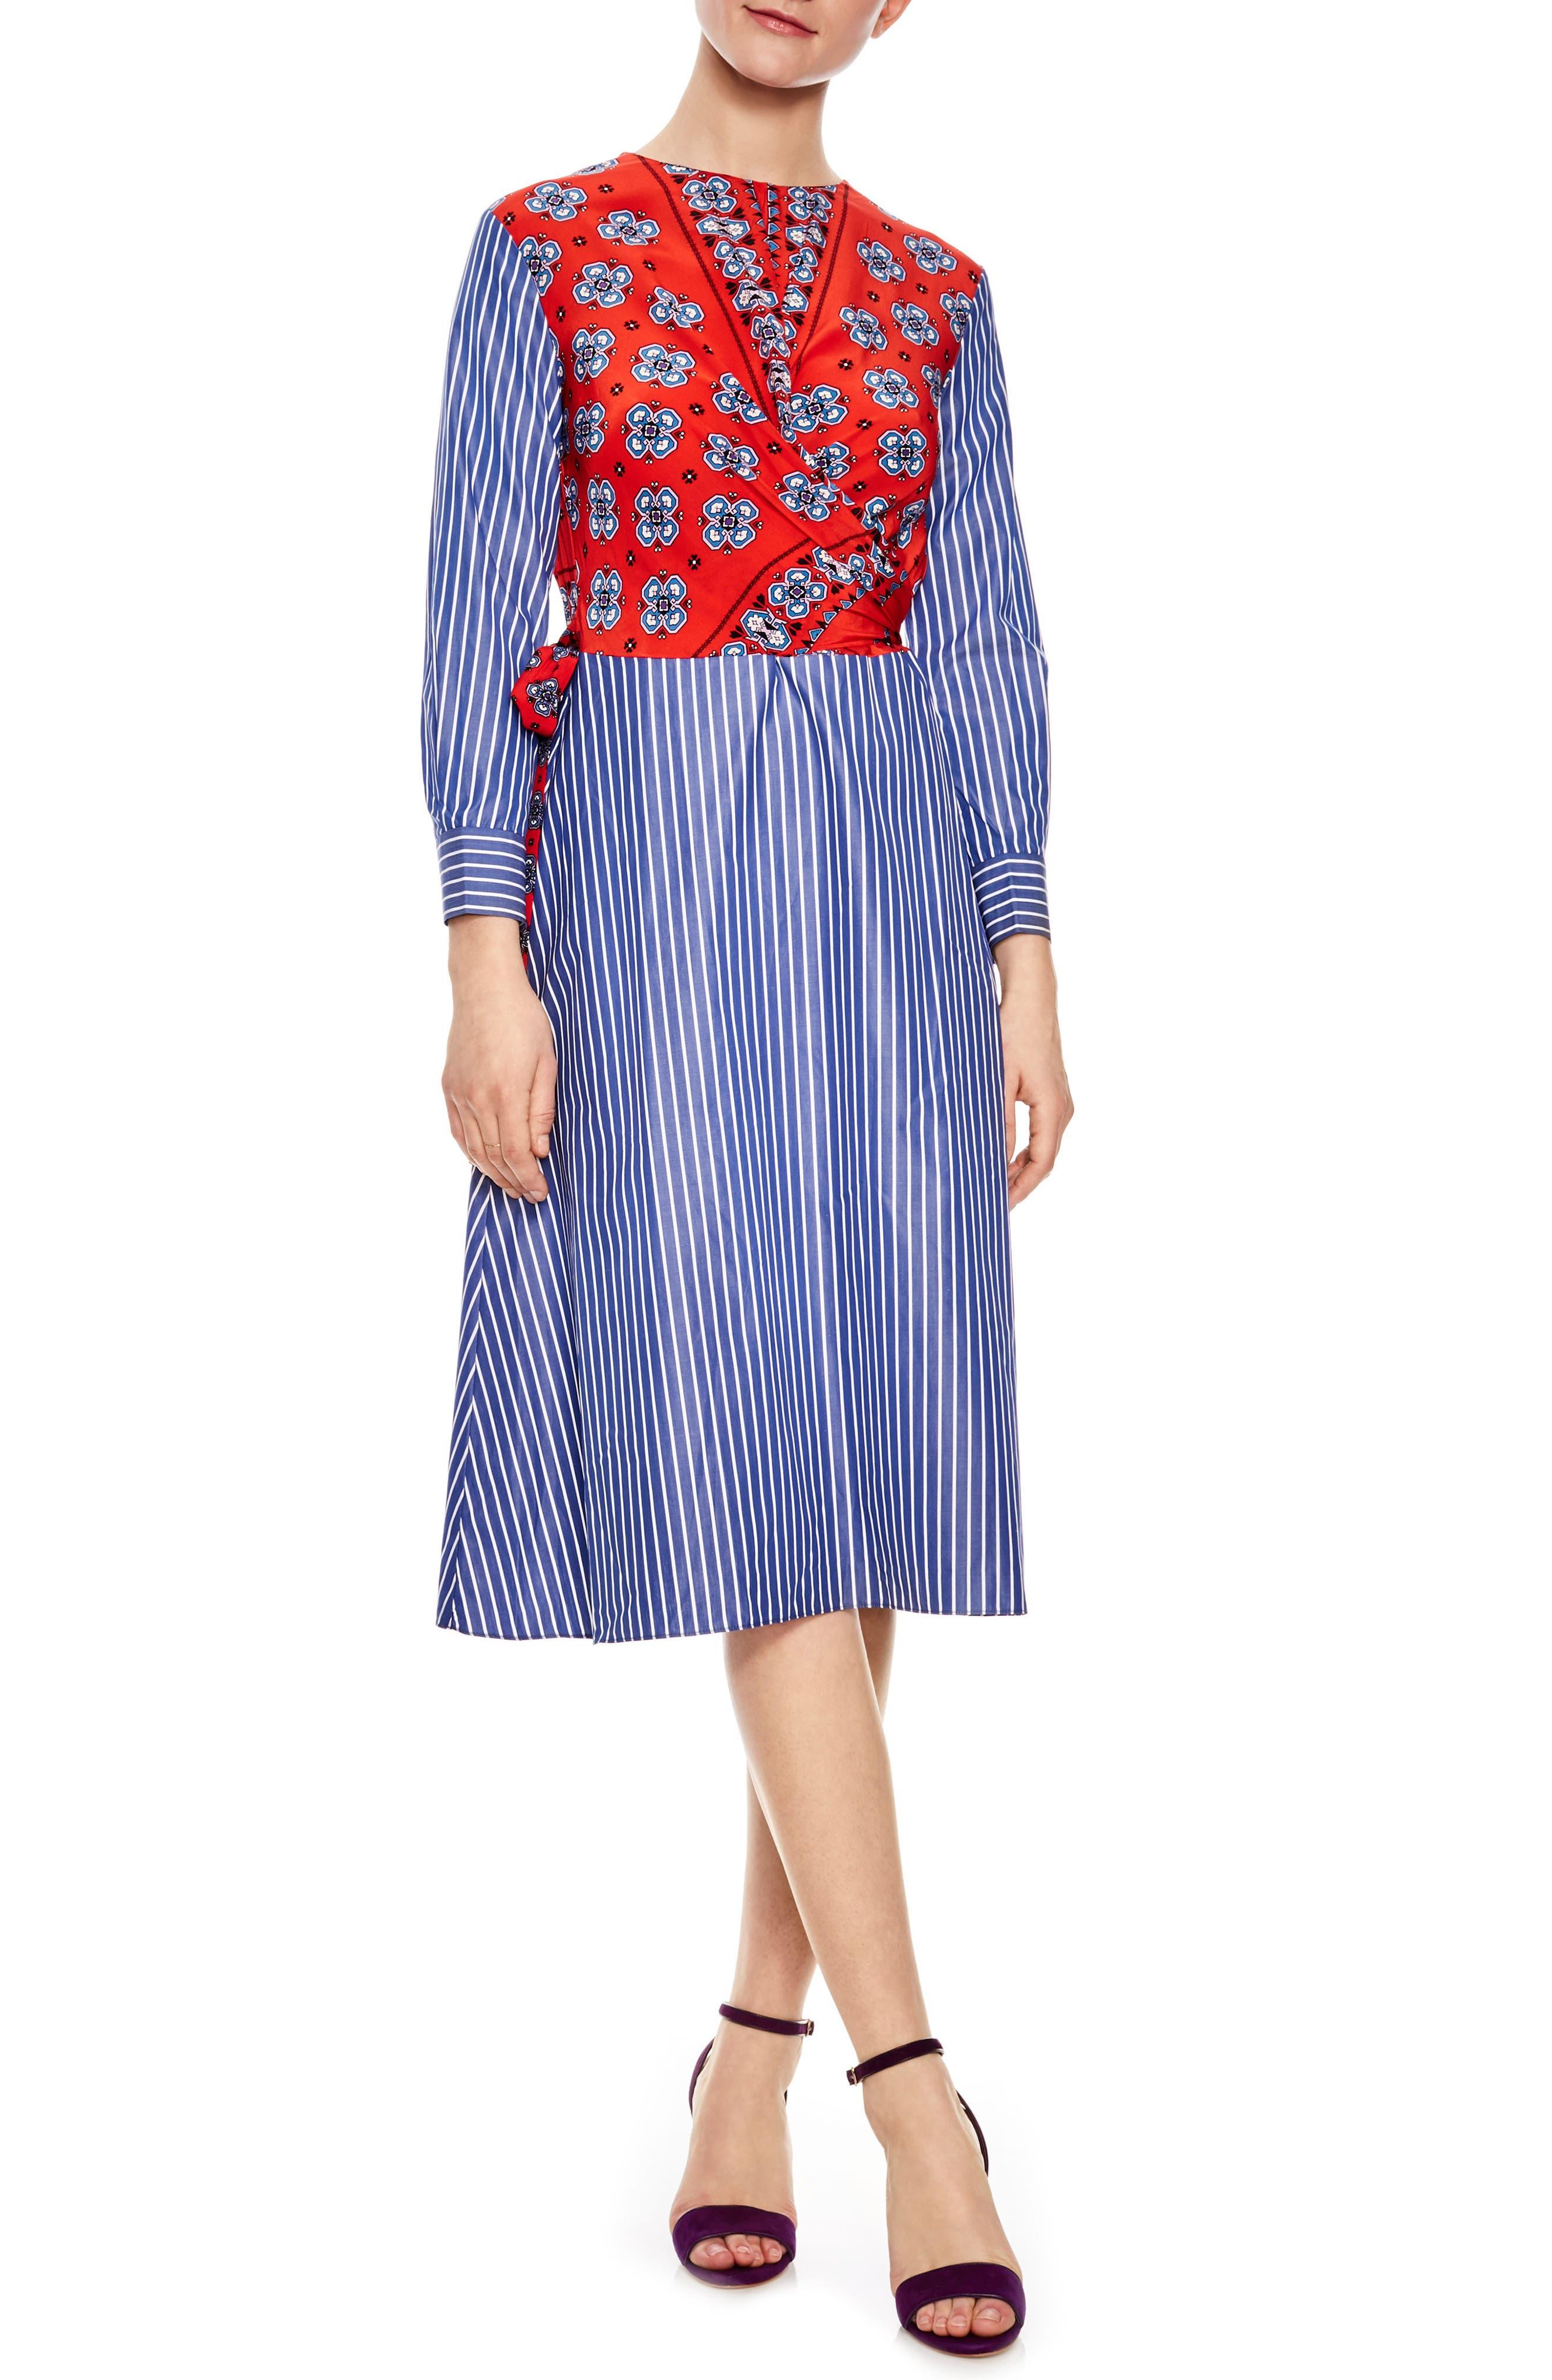 Mixed Print Cotton & Silk Faux Wrap Dress,                             Main thumbnail 1, color,                             Scarlet Red